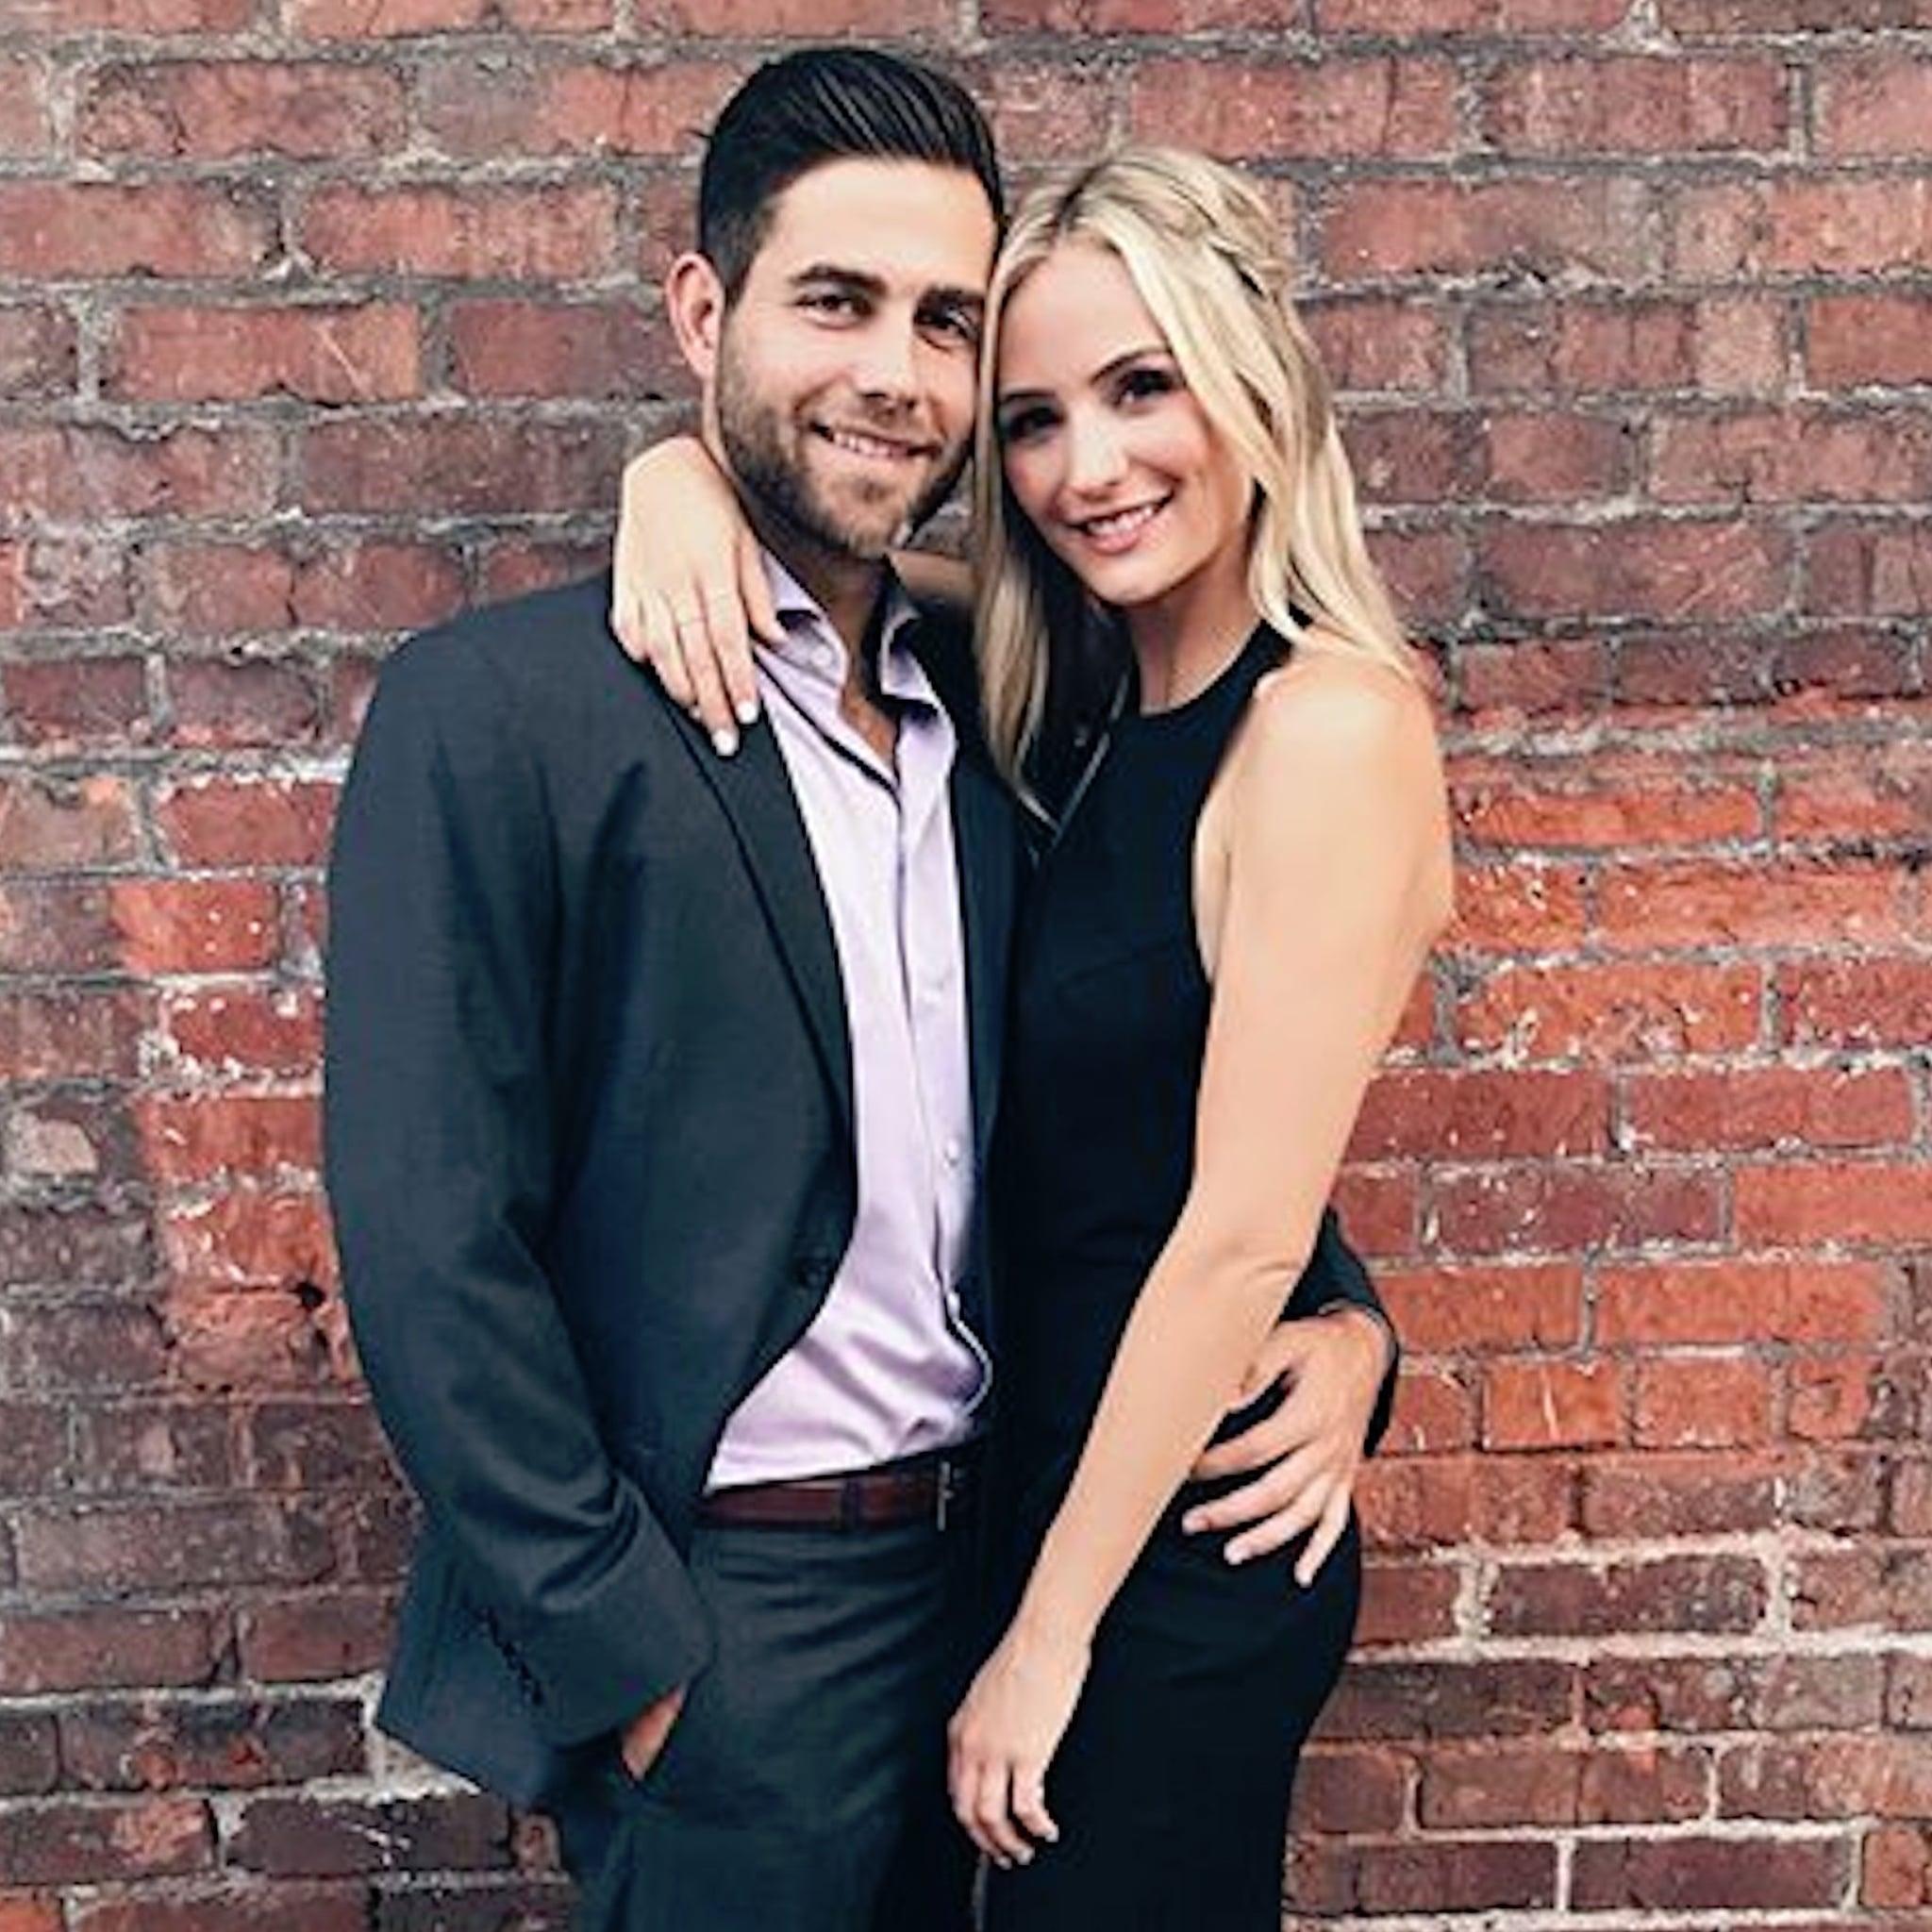 Lauren bushnell dating her ex